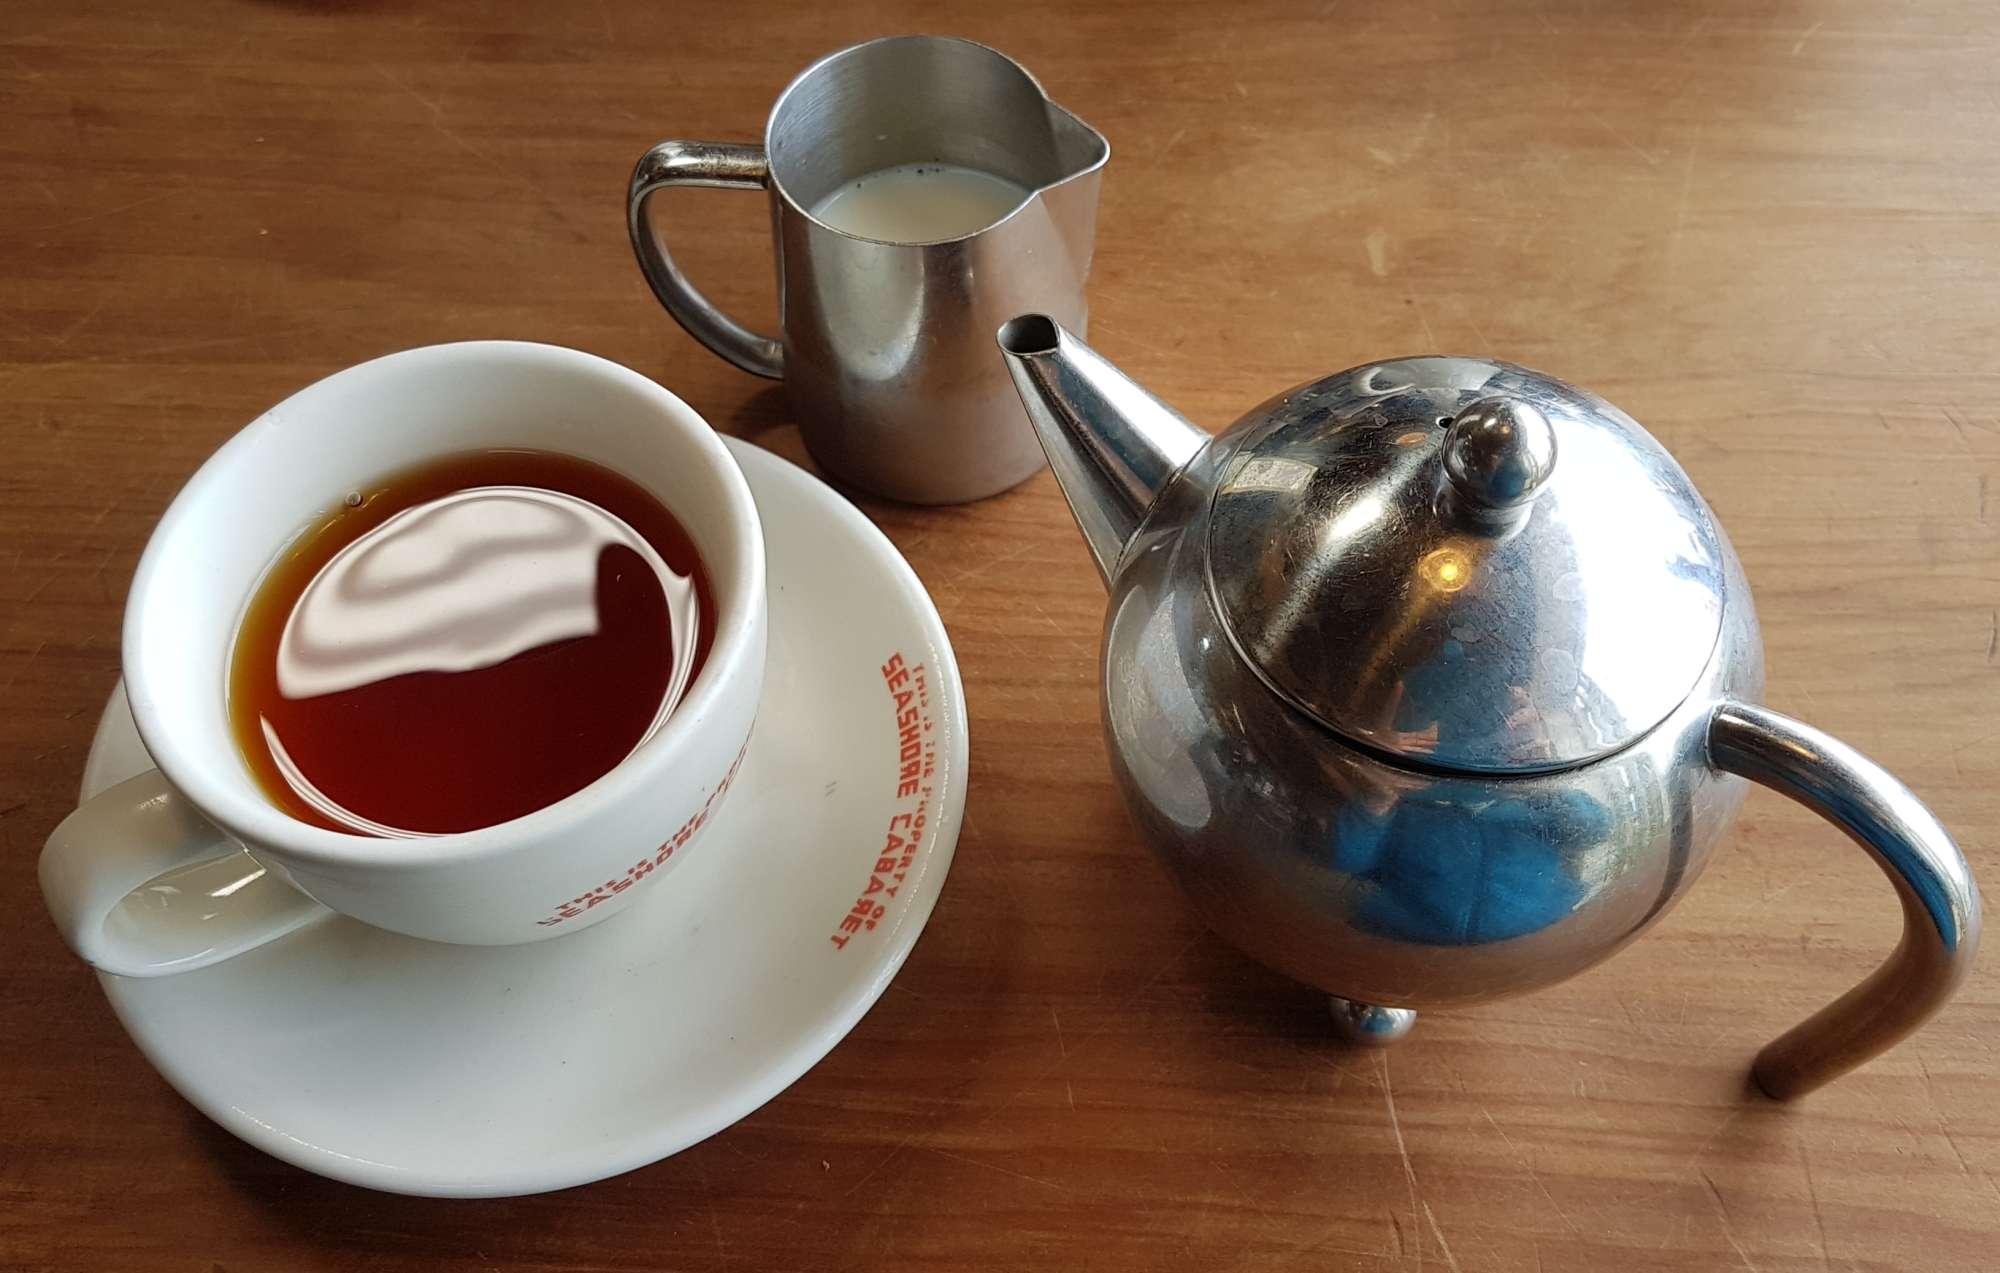 Seashore Cabaret tea